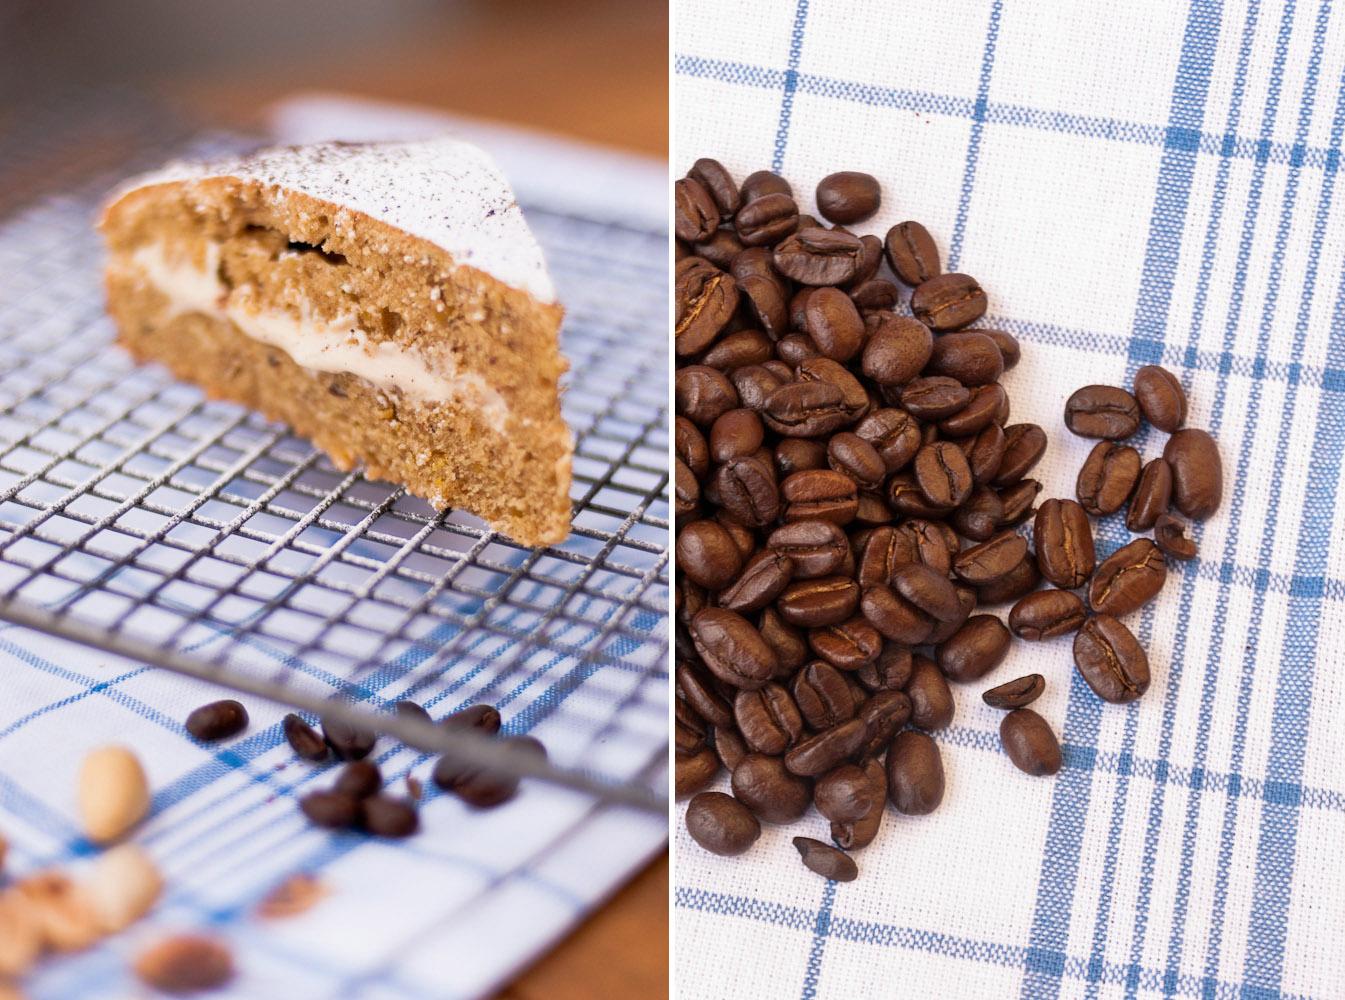 Pistachio and Coffee Cake